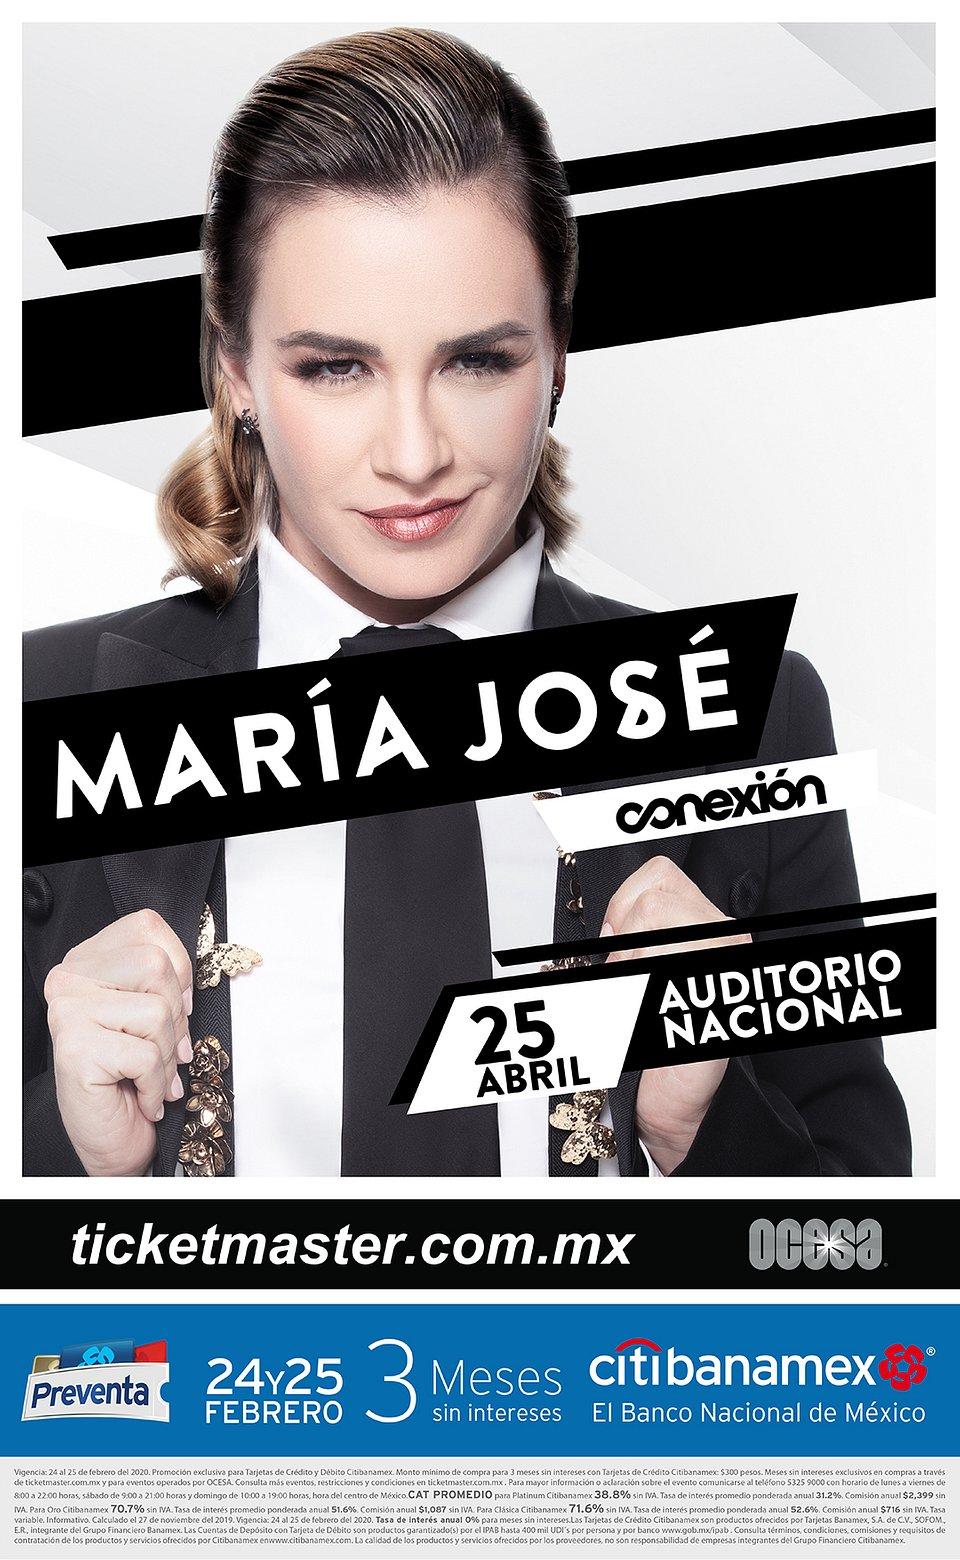 MARIA JOSE CDMX PREVENTA-01.jpg